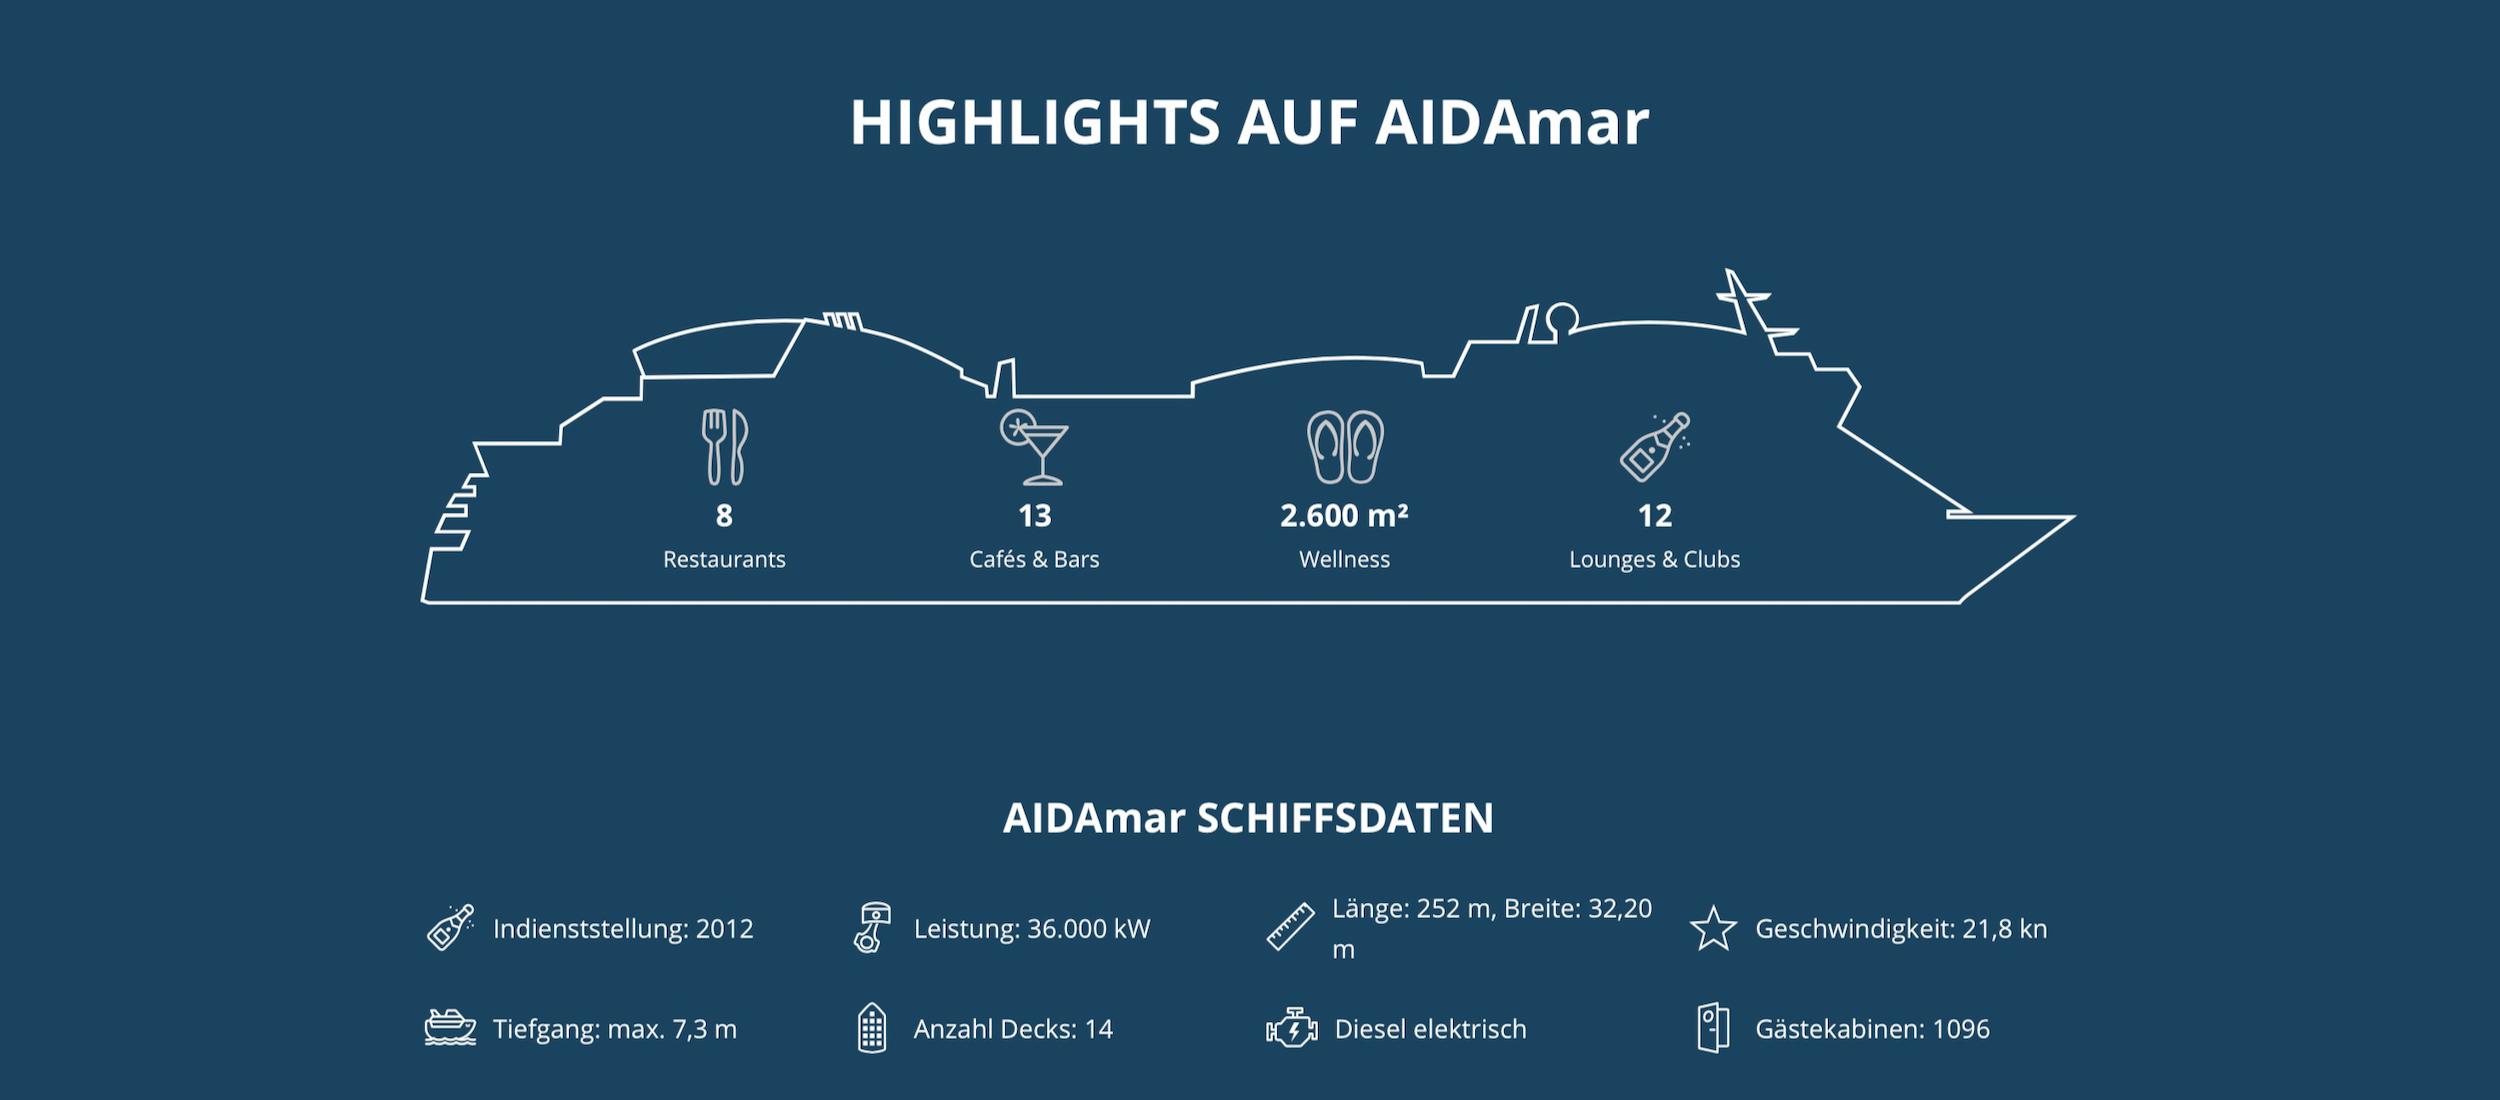 aida-cruises-ships-aidamar-daten